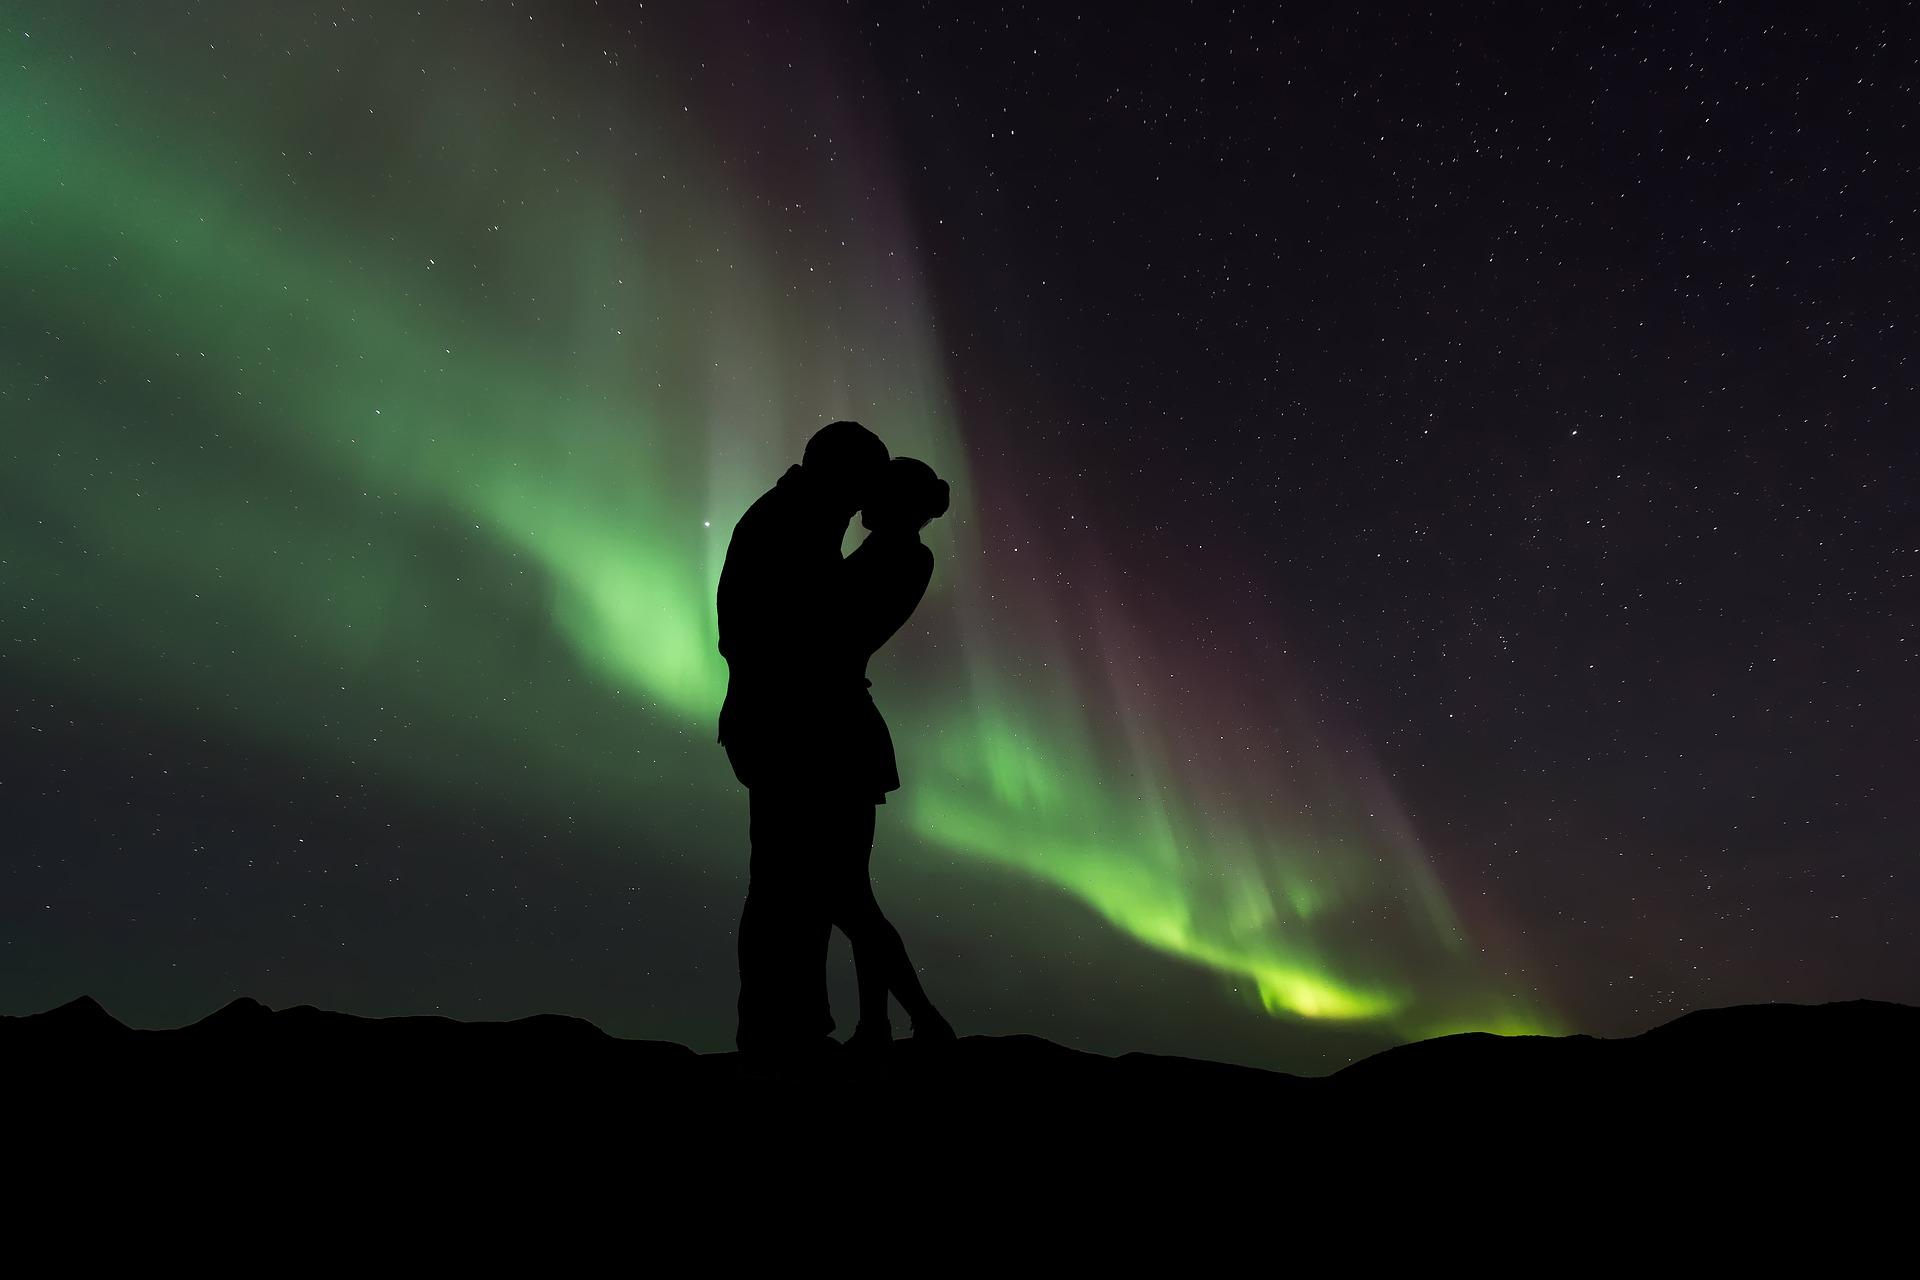 Chasing the Northern Lights – Bhavya Nayak